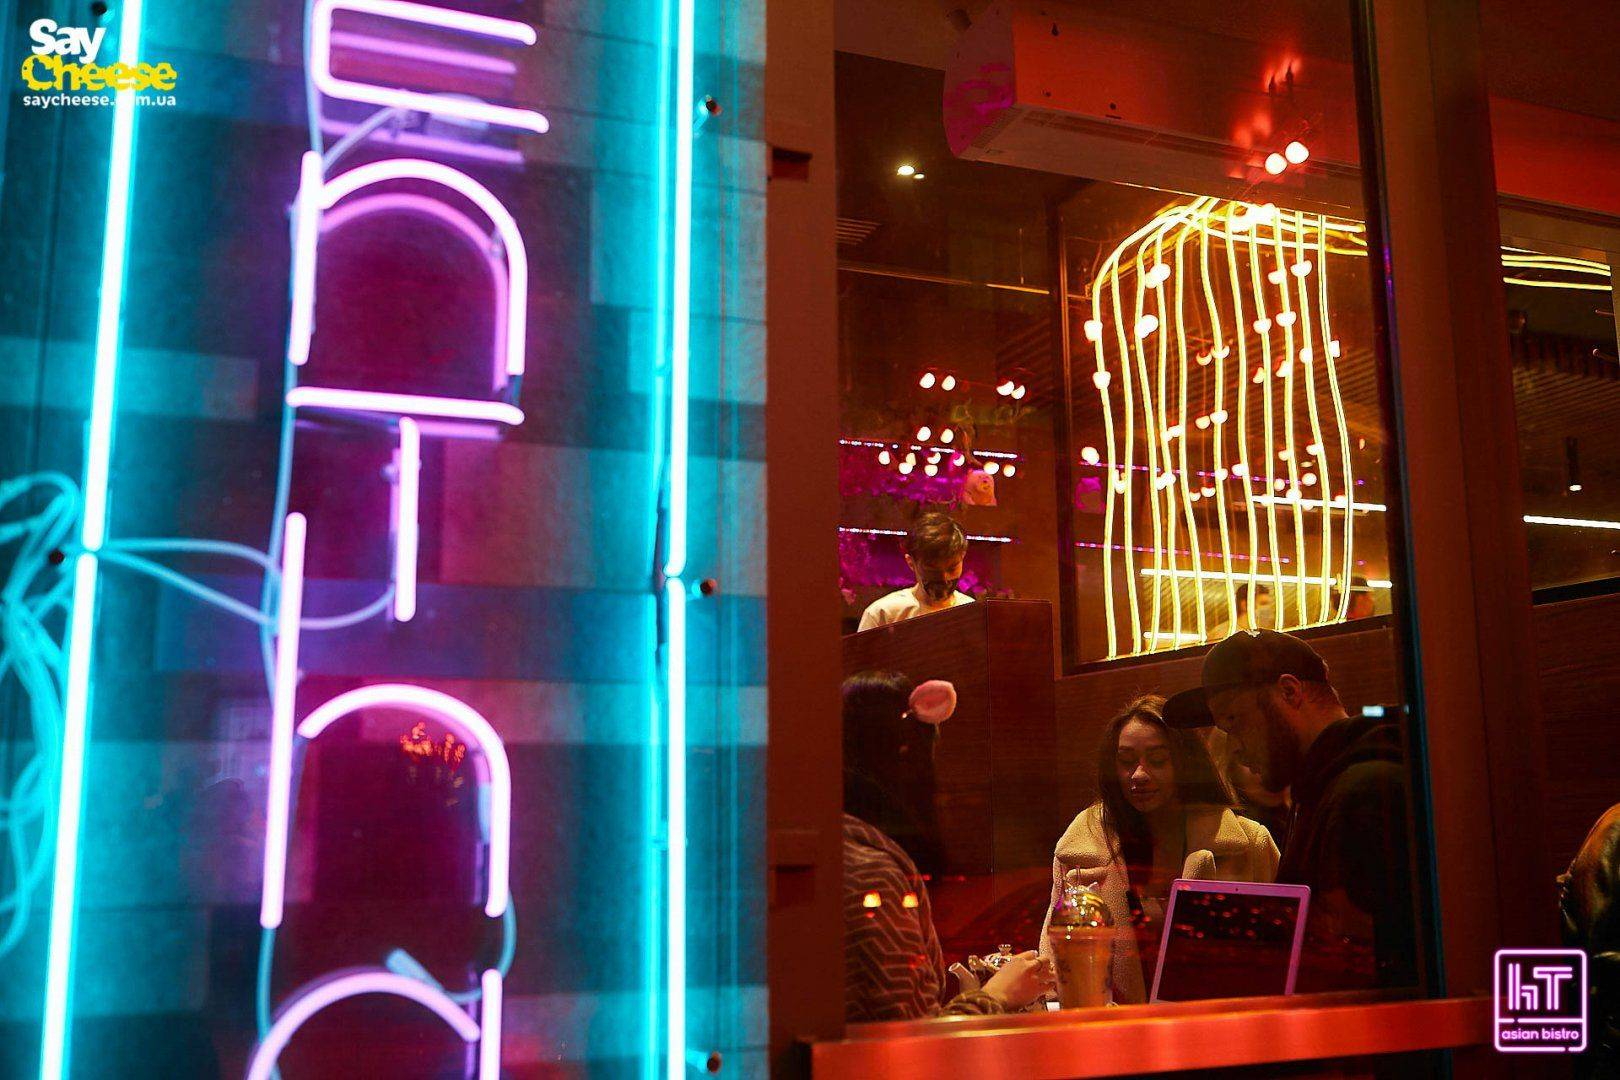 Ресторан Hen Thai Харьков Saycheese